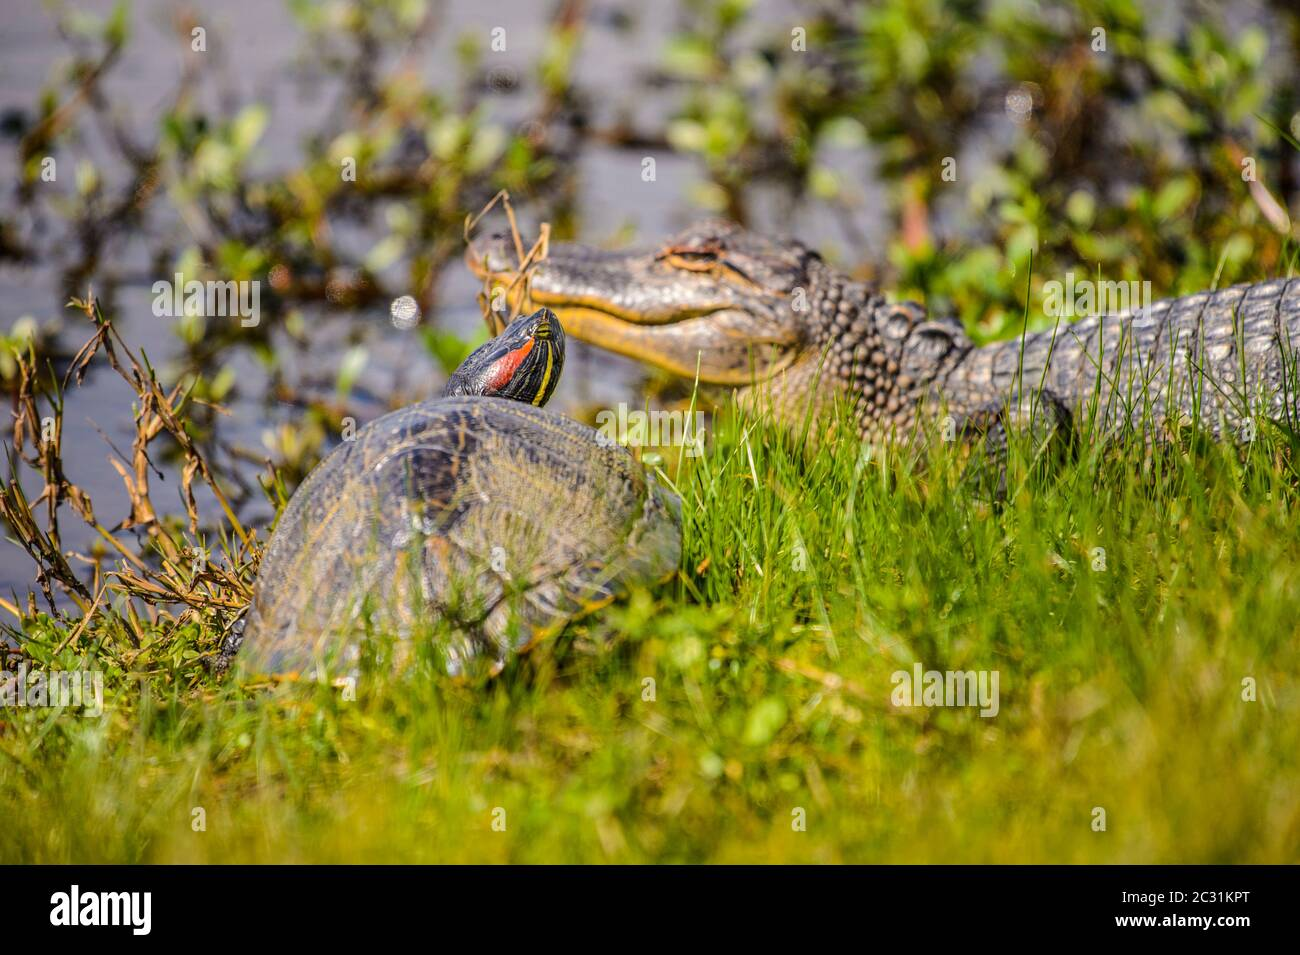 Basking alligator (Alligator mississipiensis) and turtle, Cameron Prairie National Wildlife Refuge, Louisiana, USA Stock Photo